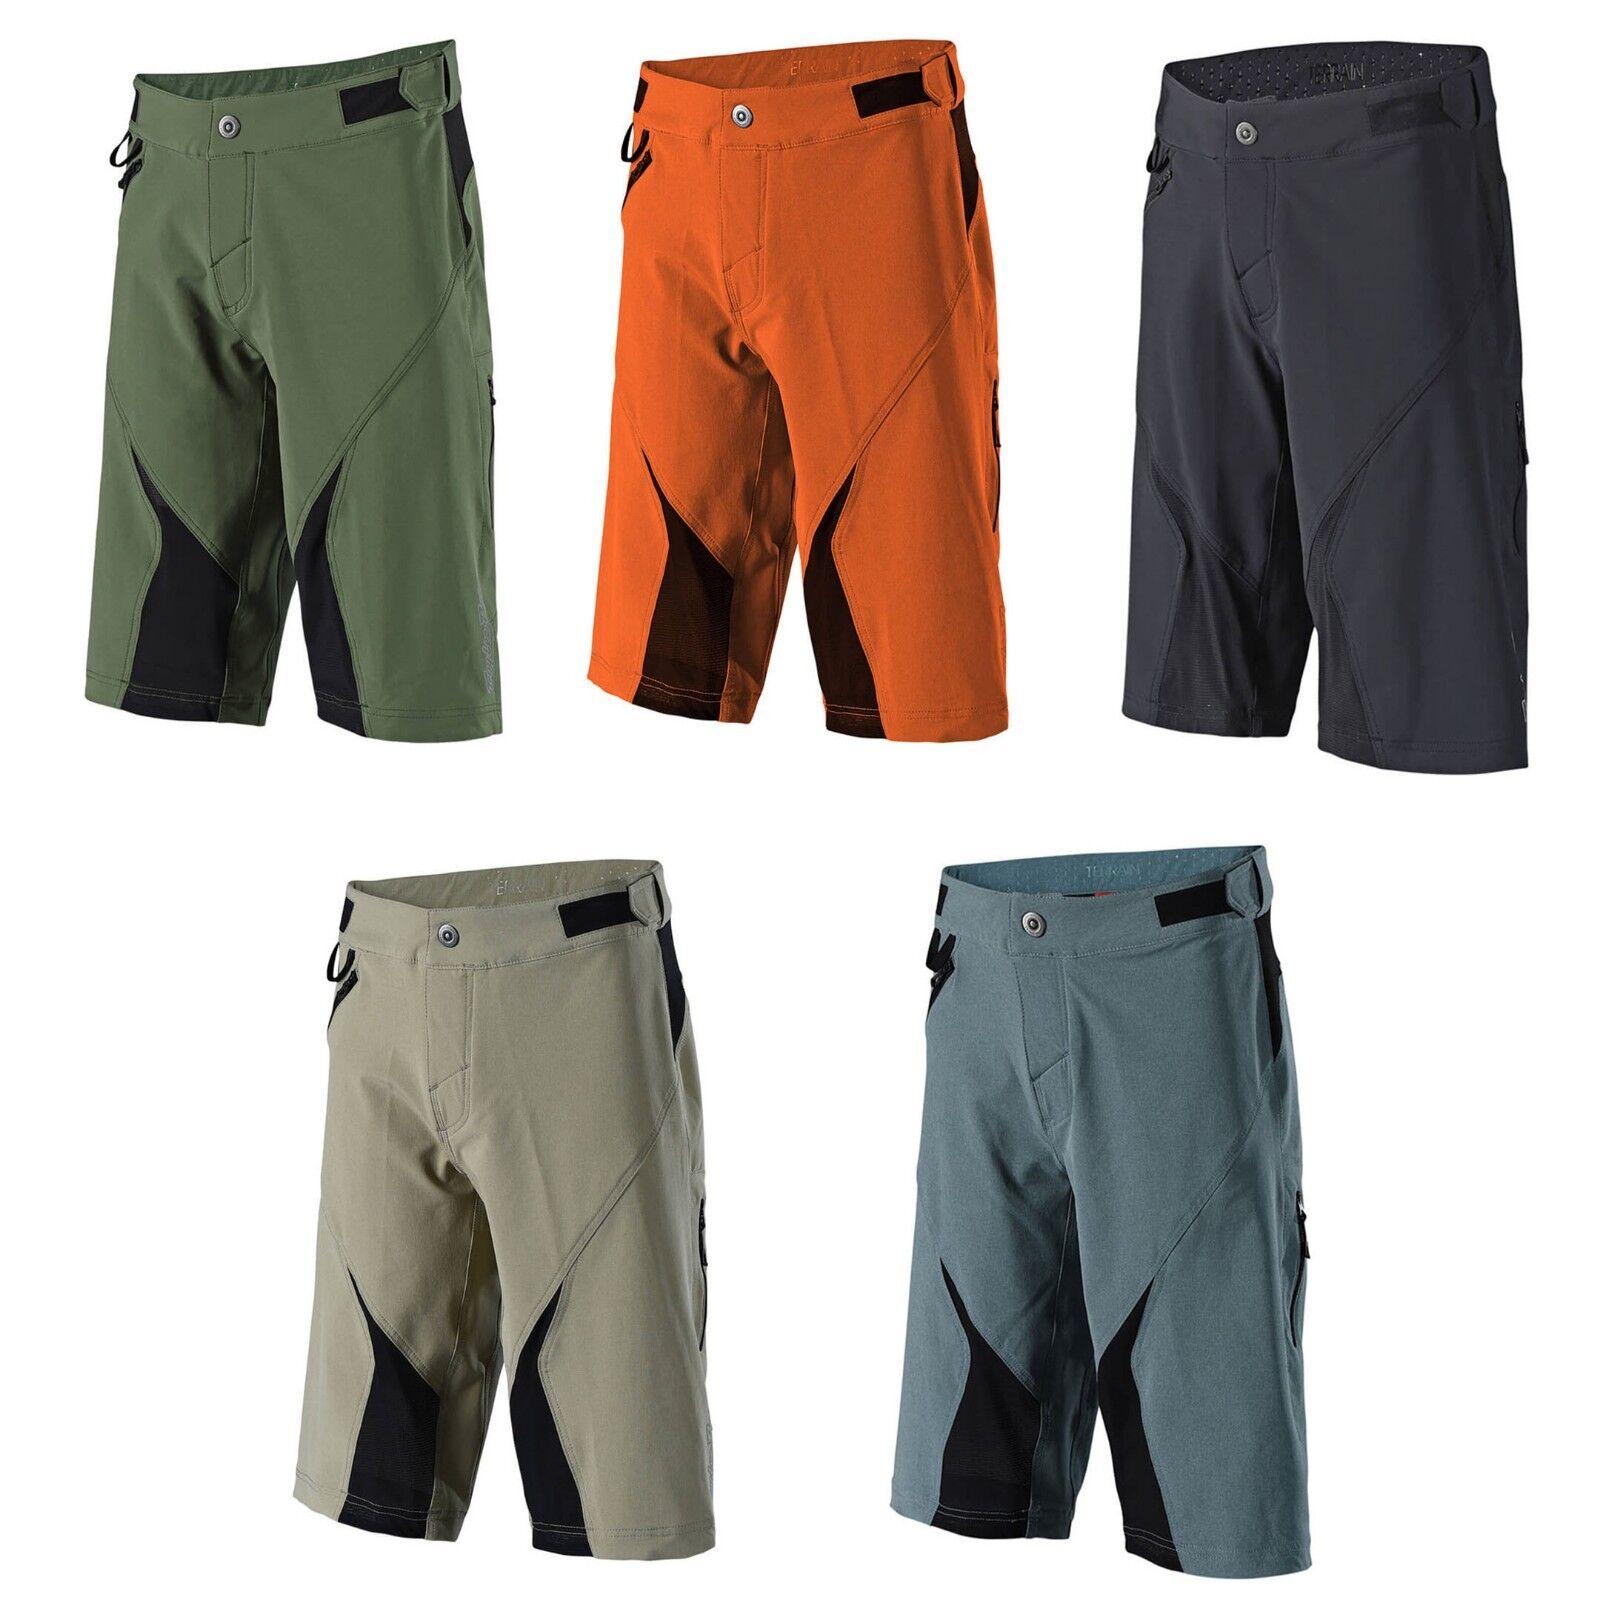 2018 Troy Mountain Lee Designs TLD  Herren Terrain Shorts Mountain Troy Bike Cycle Cycling 231003 616ce7